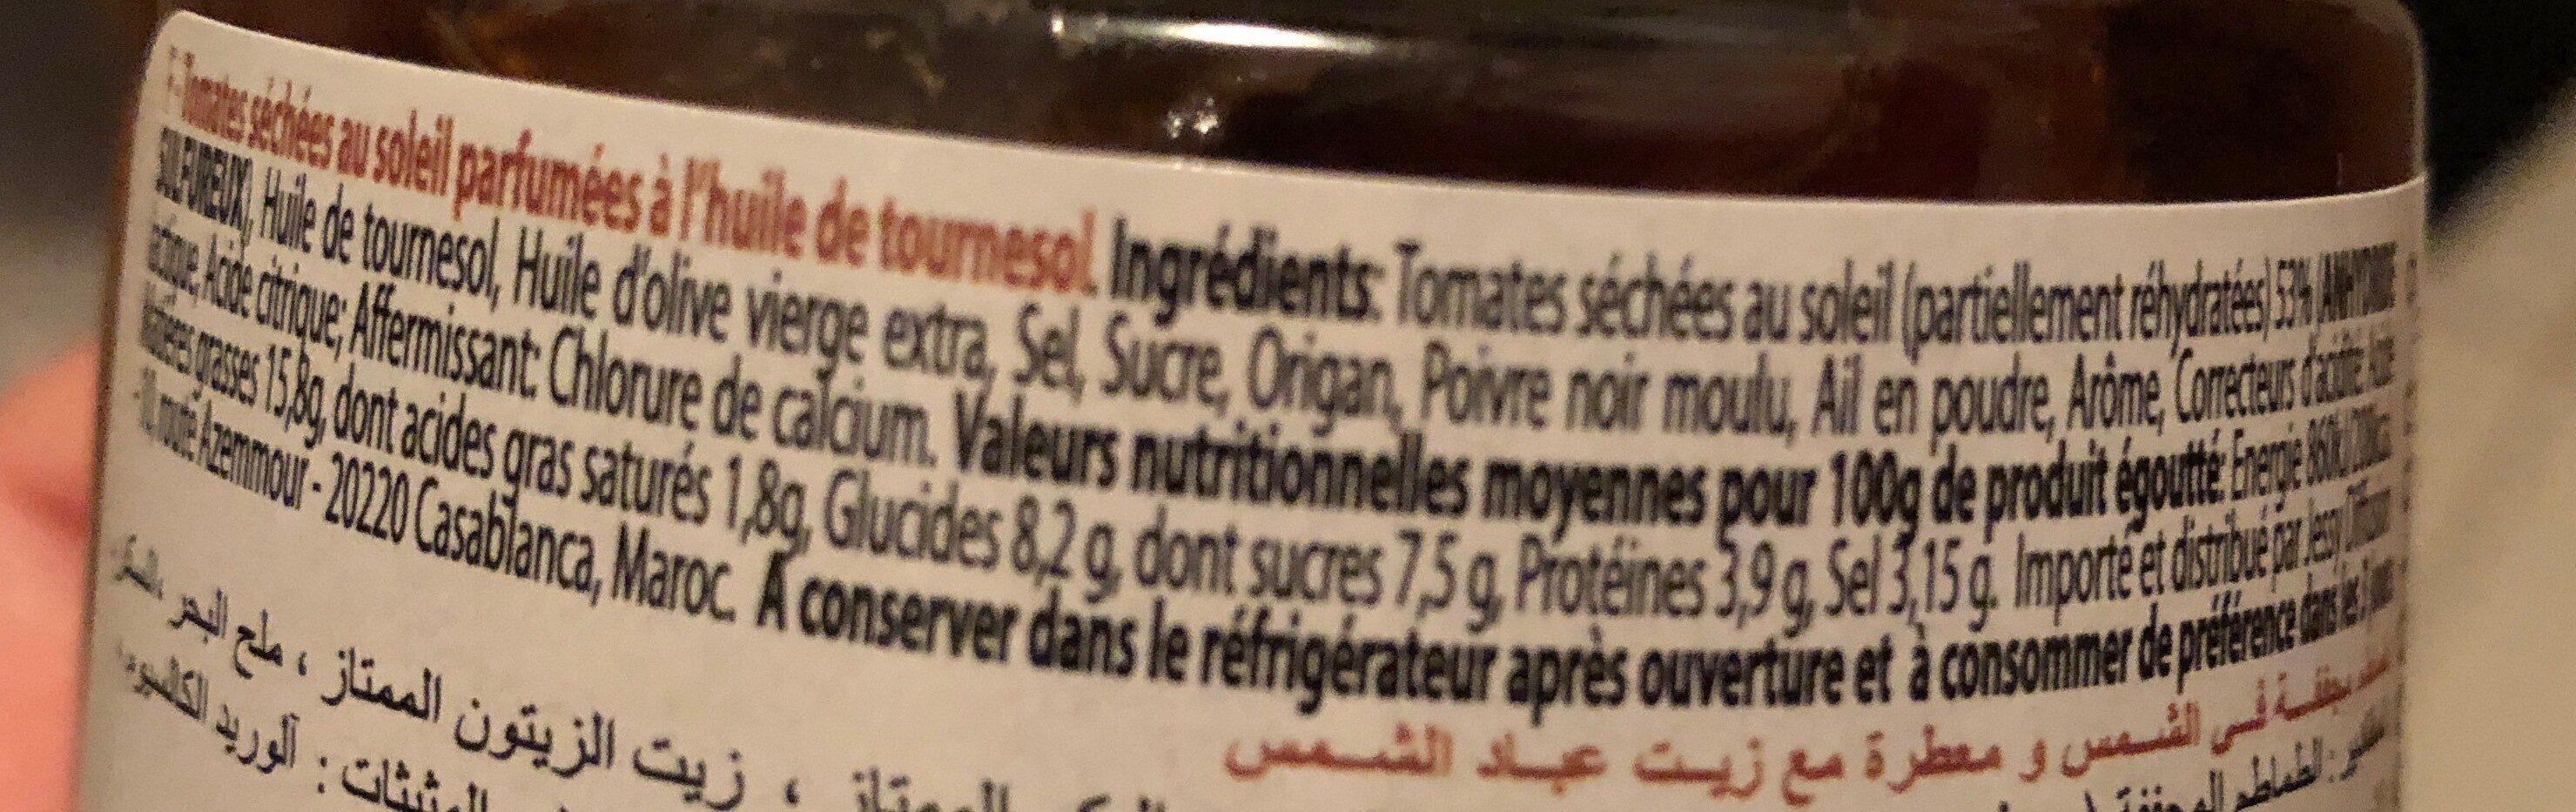 Pomodori secchi - Voedingswaarden - fr